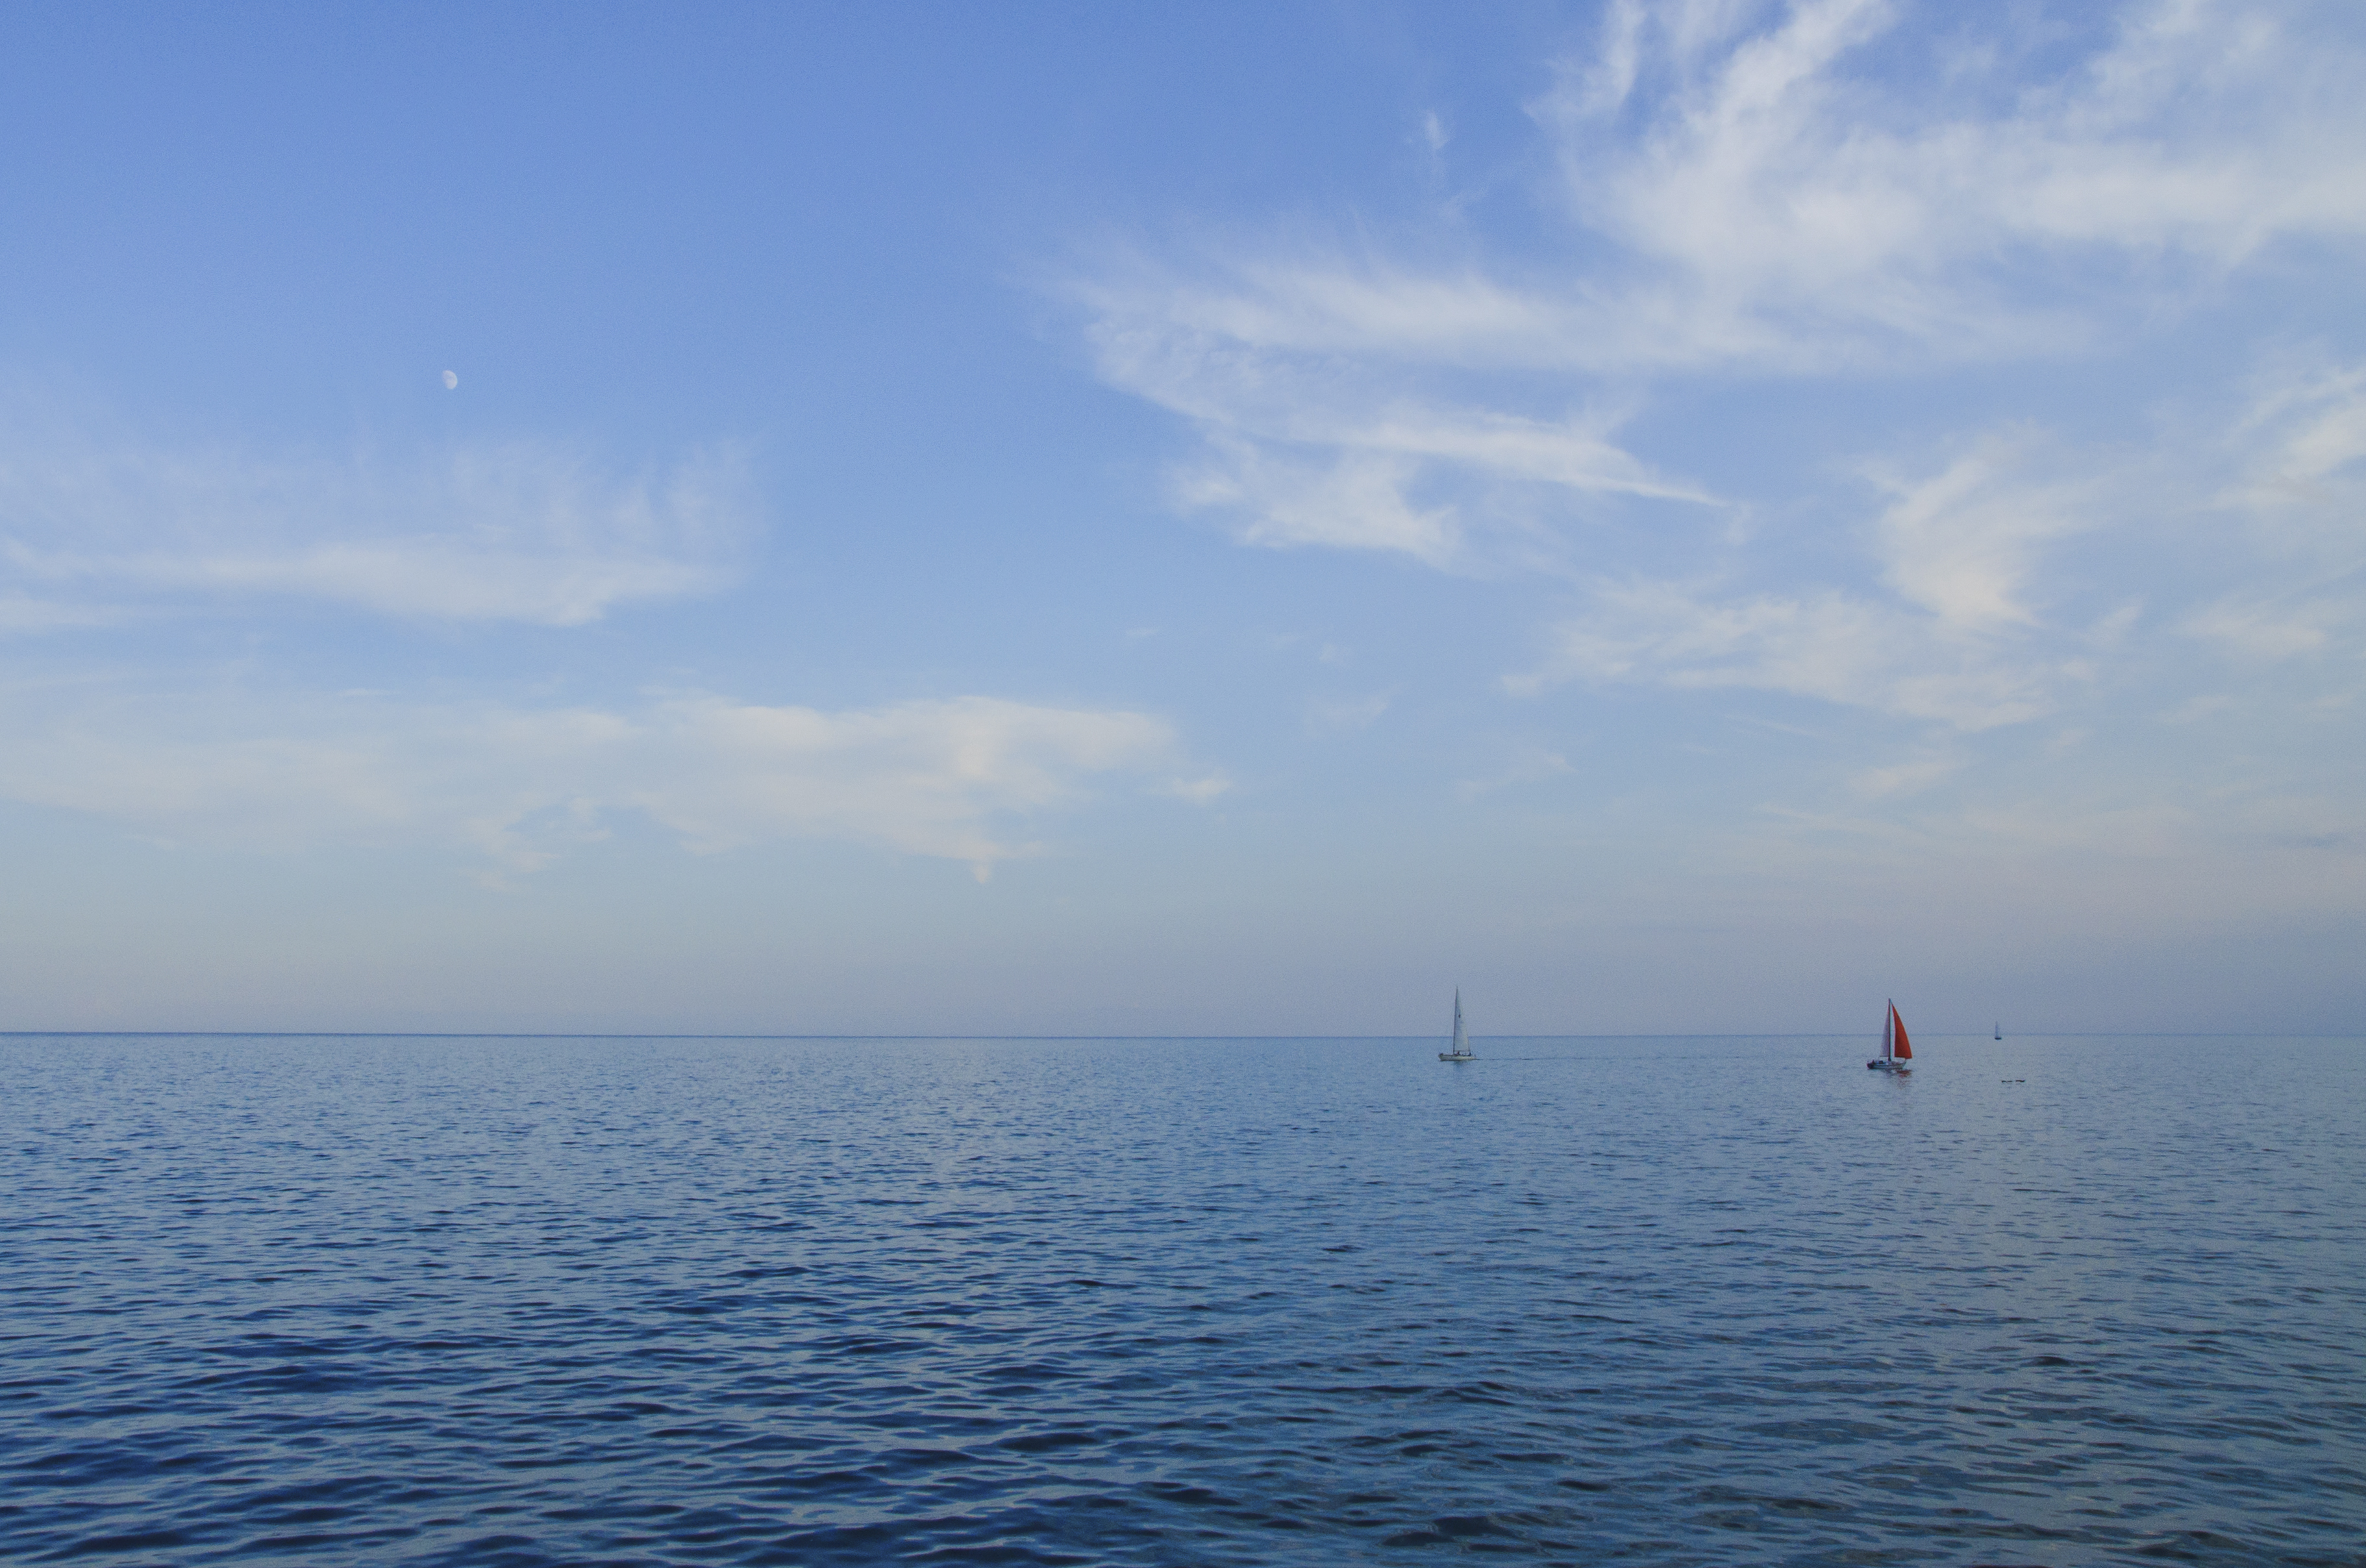 At the Sea, Boats, Clouds, Lake, River, HQ Photo